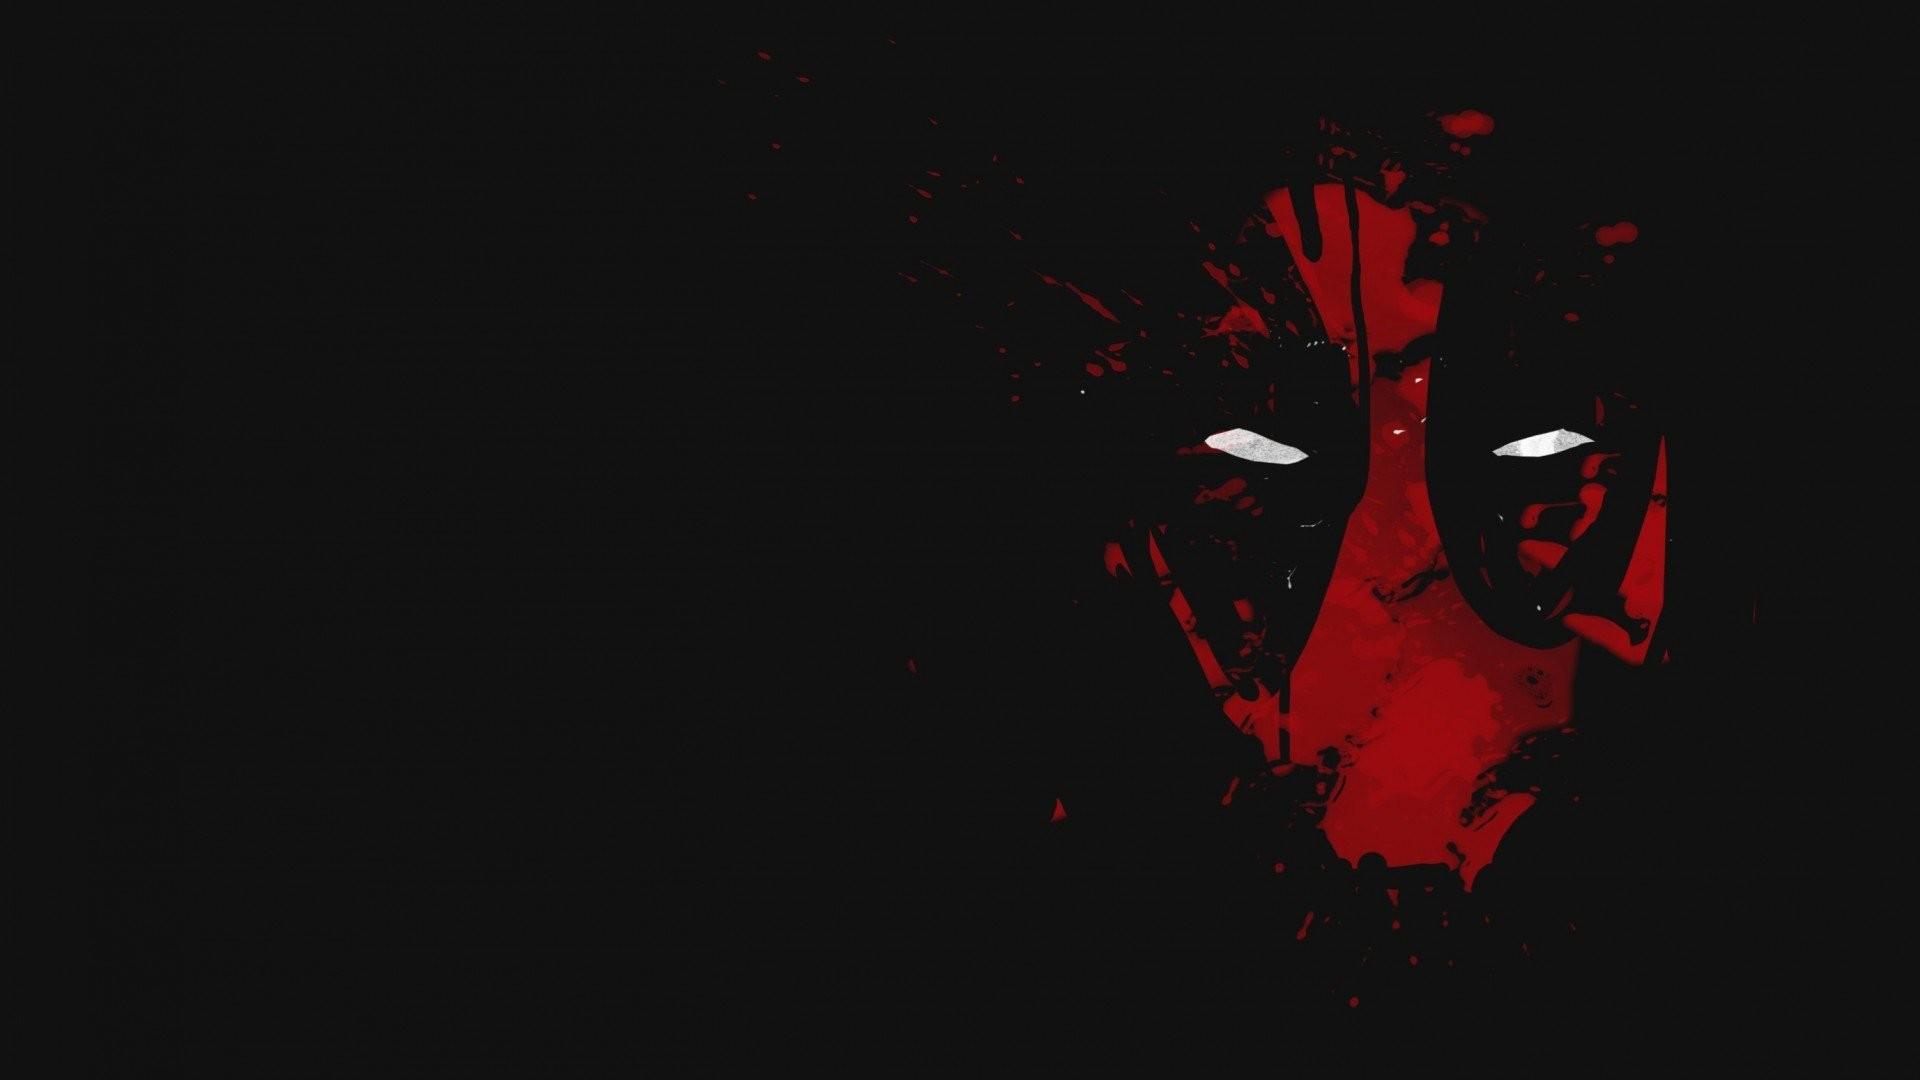 deadpool wallpaper download for pc